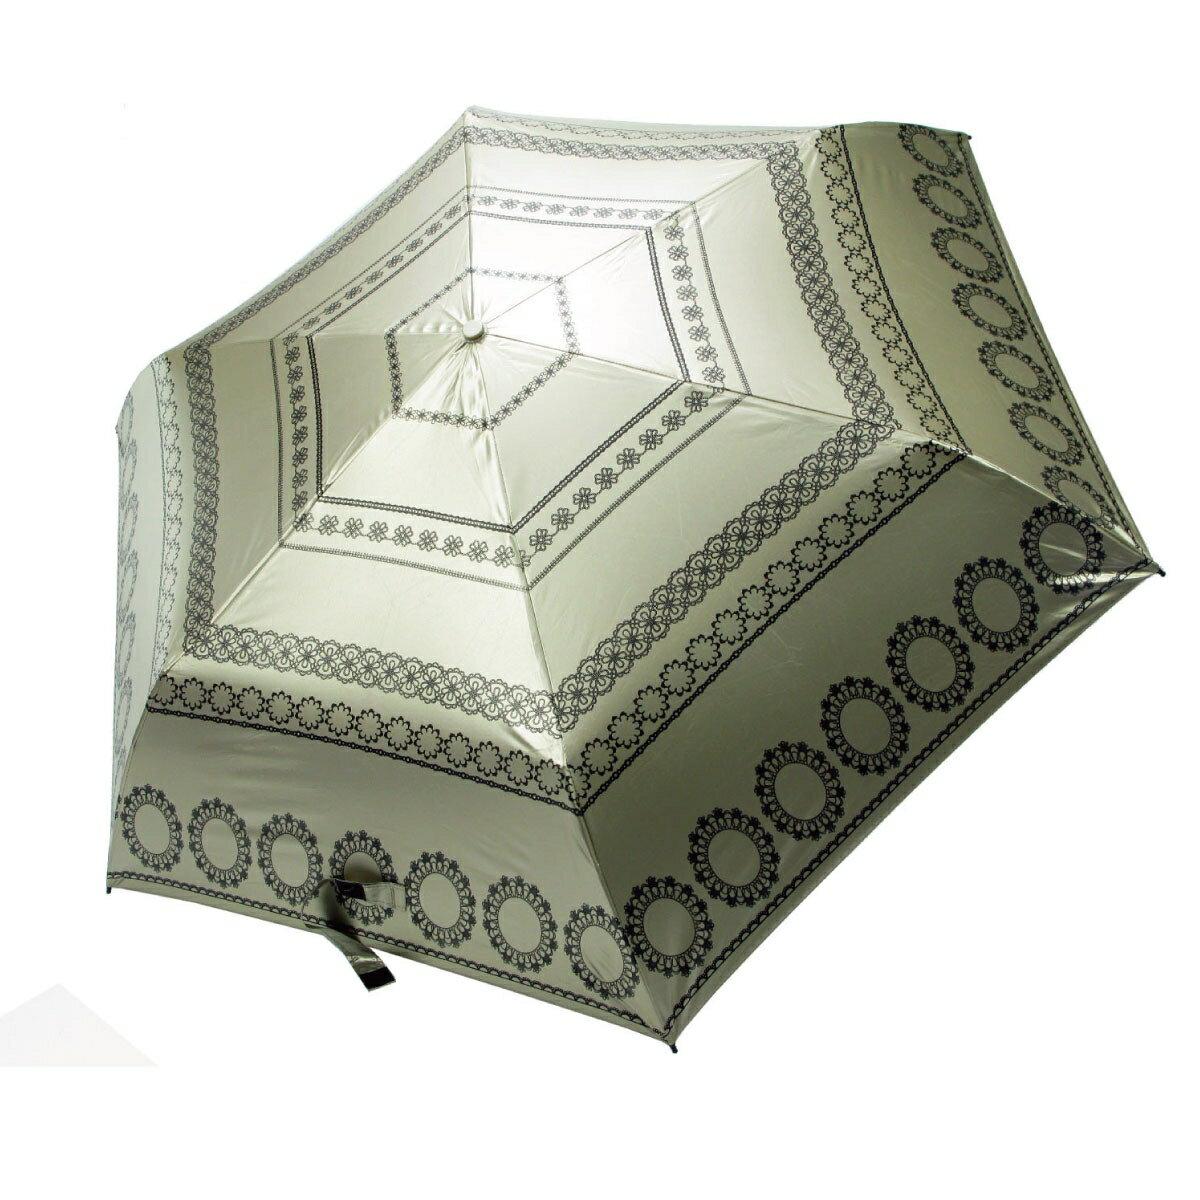 【iumbrella】典藏歐風手開紫外線變色傘-高雅金